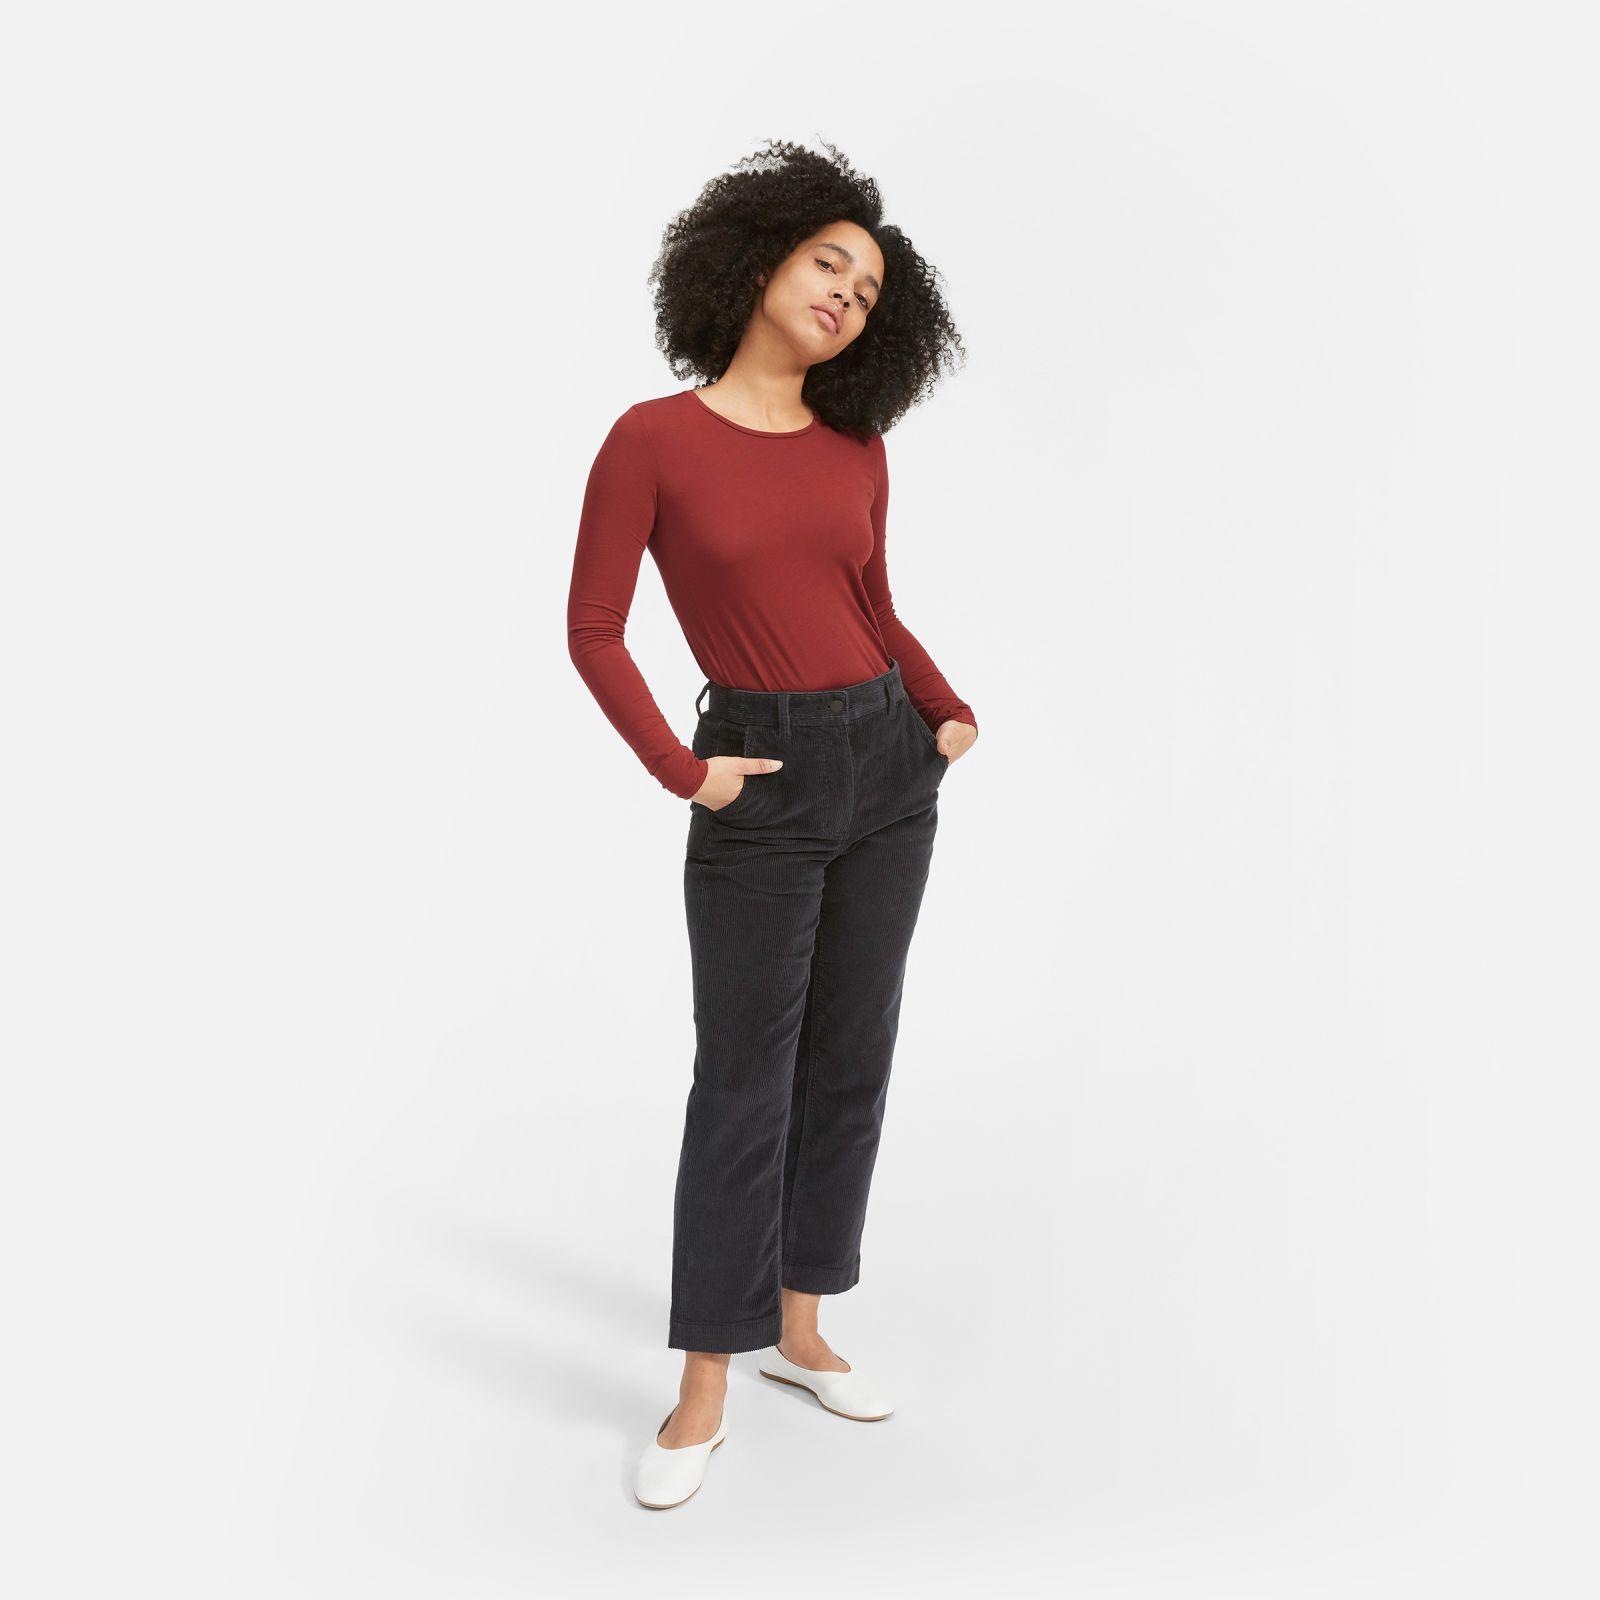 women's pima stretch long-sleeve t-shirt by everlane in crimson, size xl